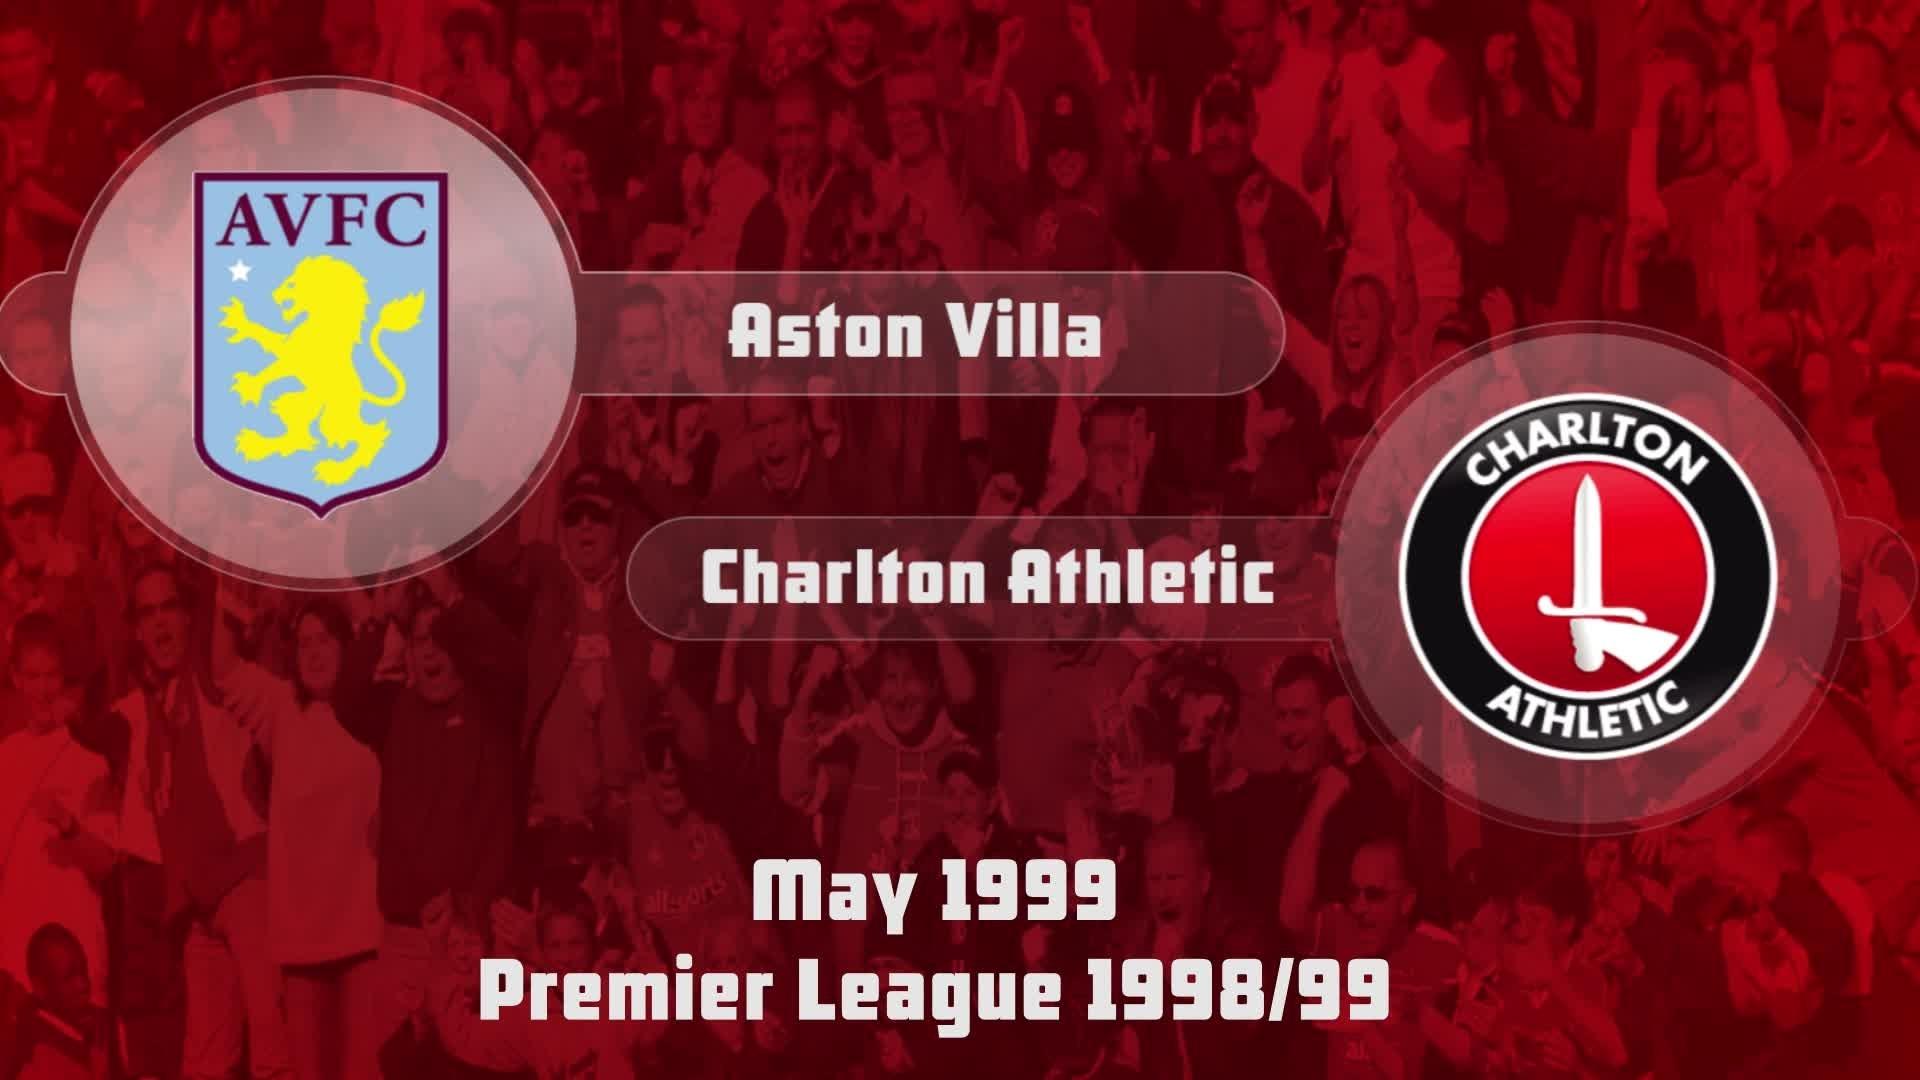 41 HIGHLIGHTS | Aston Villa 3 Charlton 4 (May 1999)